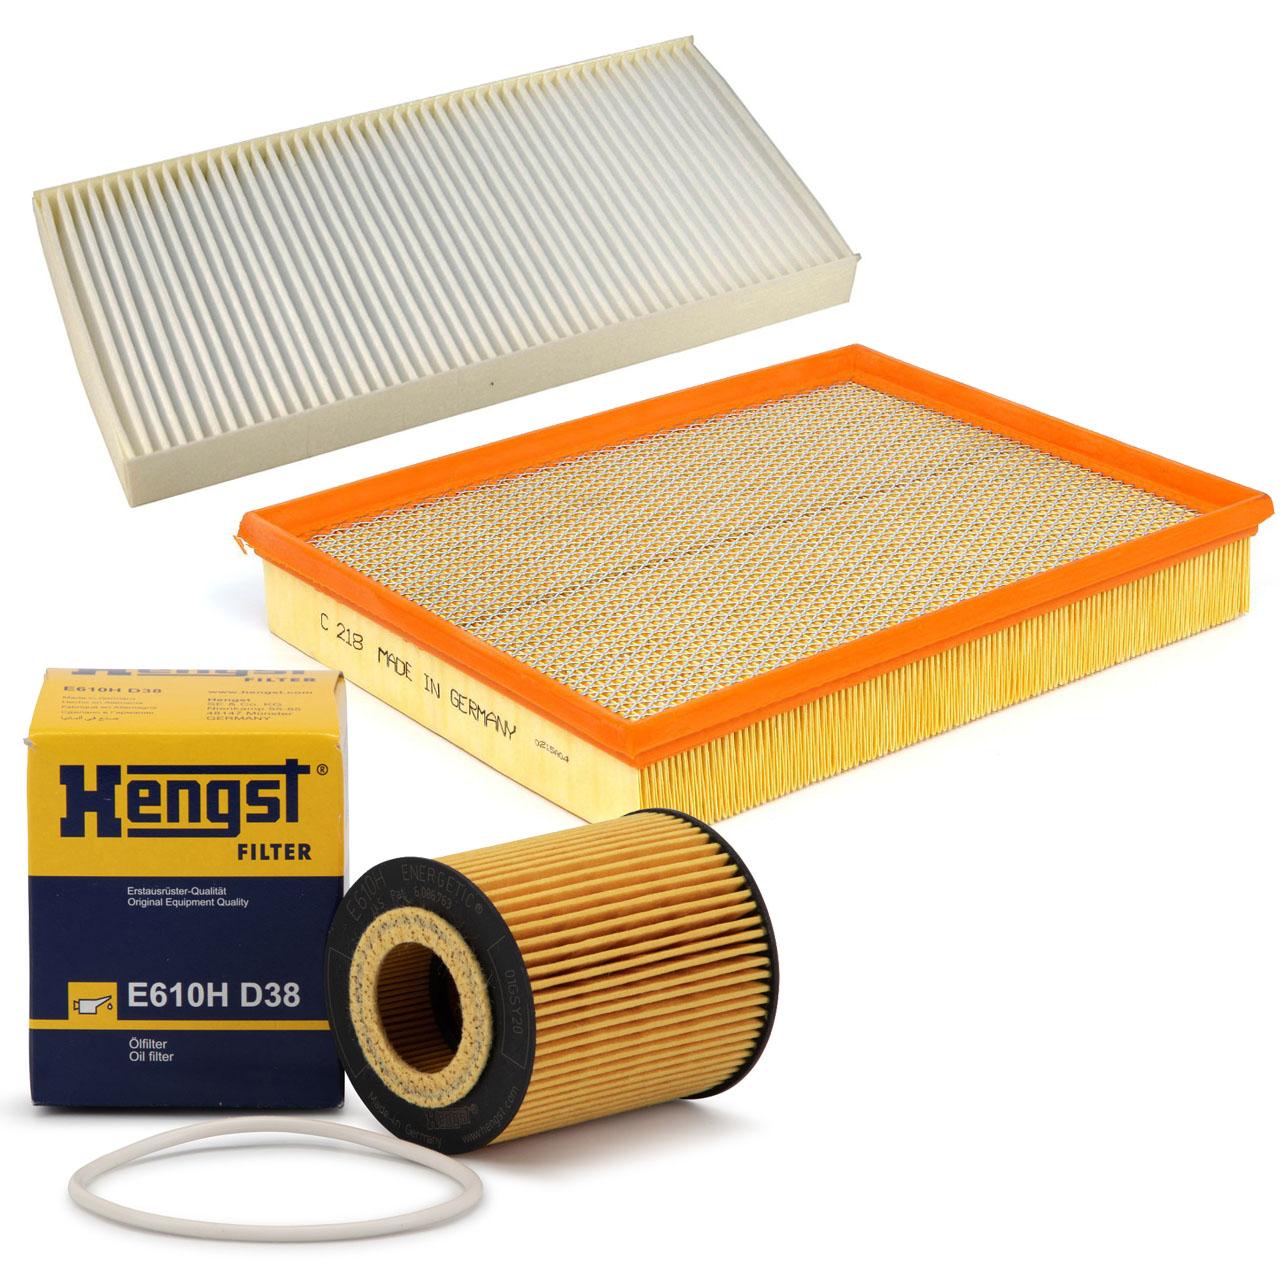 Inspektionskit Filterpaket OPEL Signum CC Vectra C 3.2 V6 211 PS Z32SE